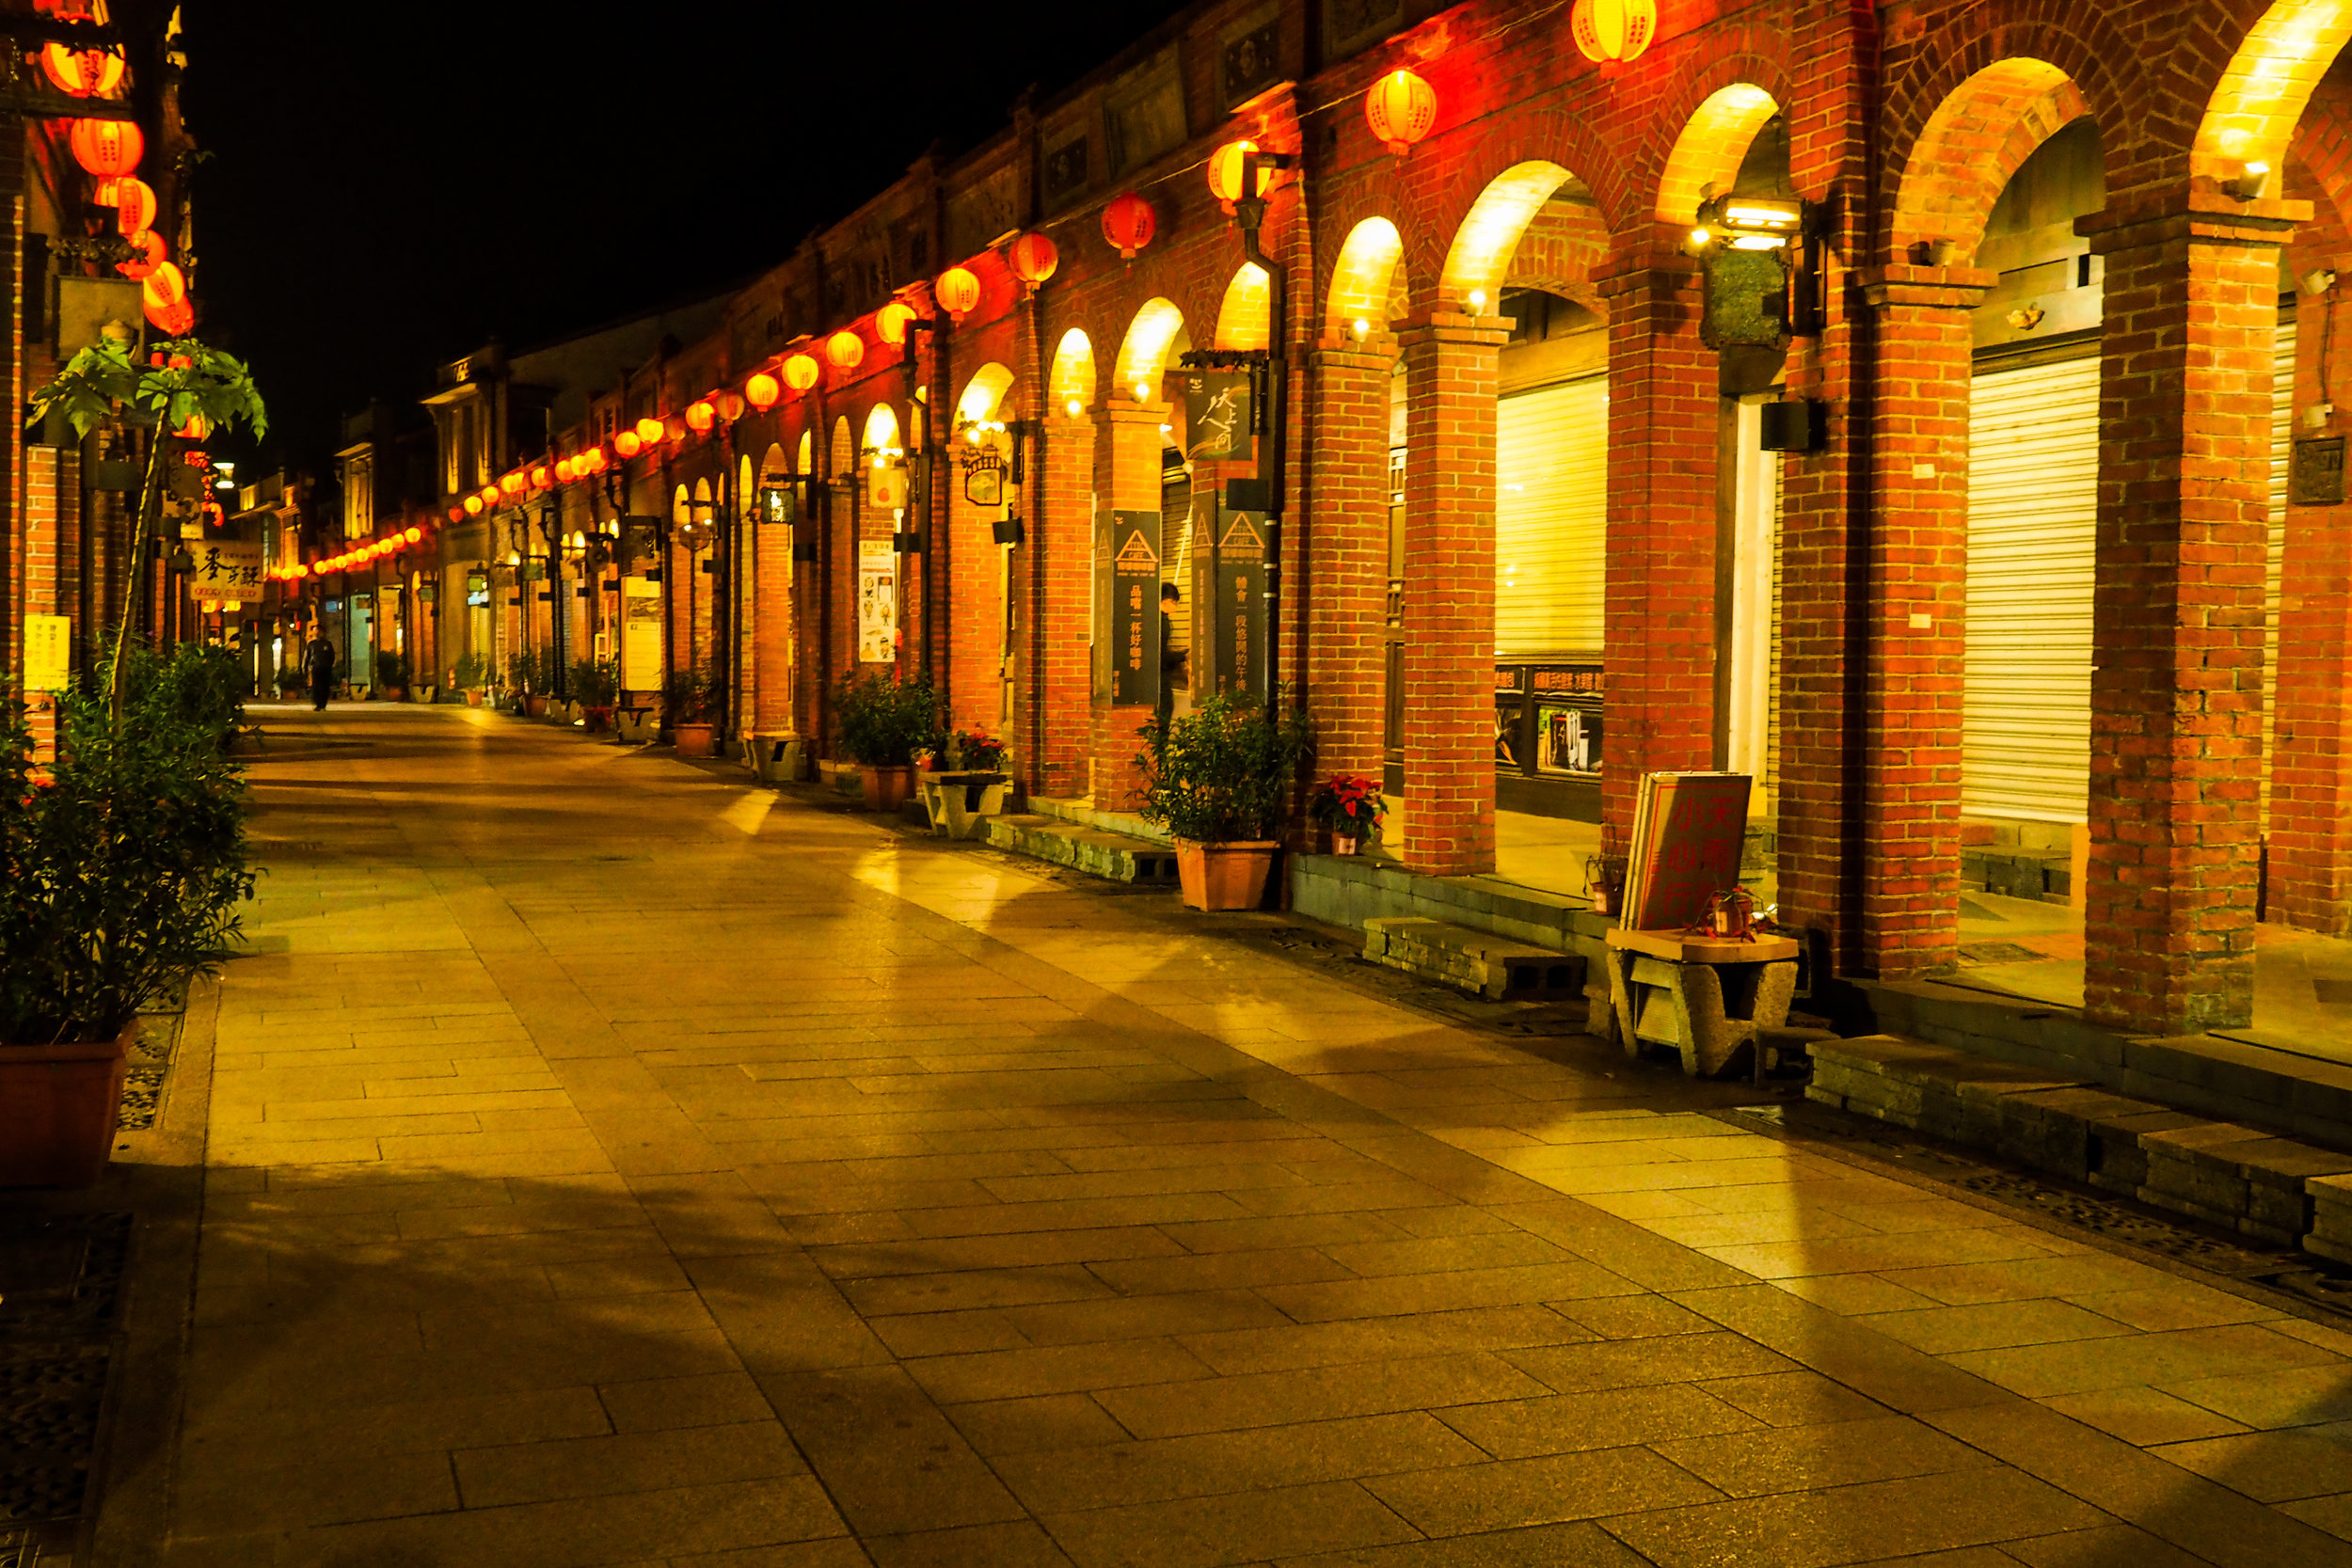 Sanxia Old Street - Street Guide